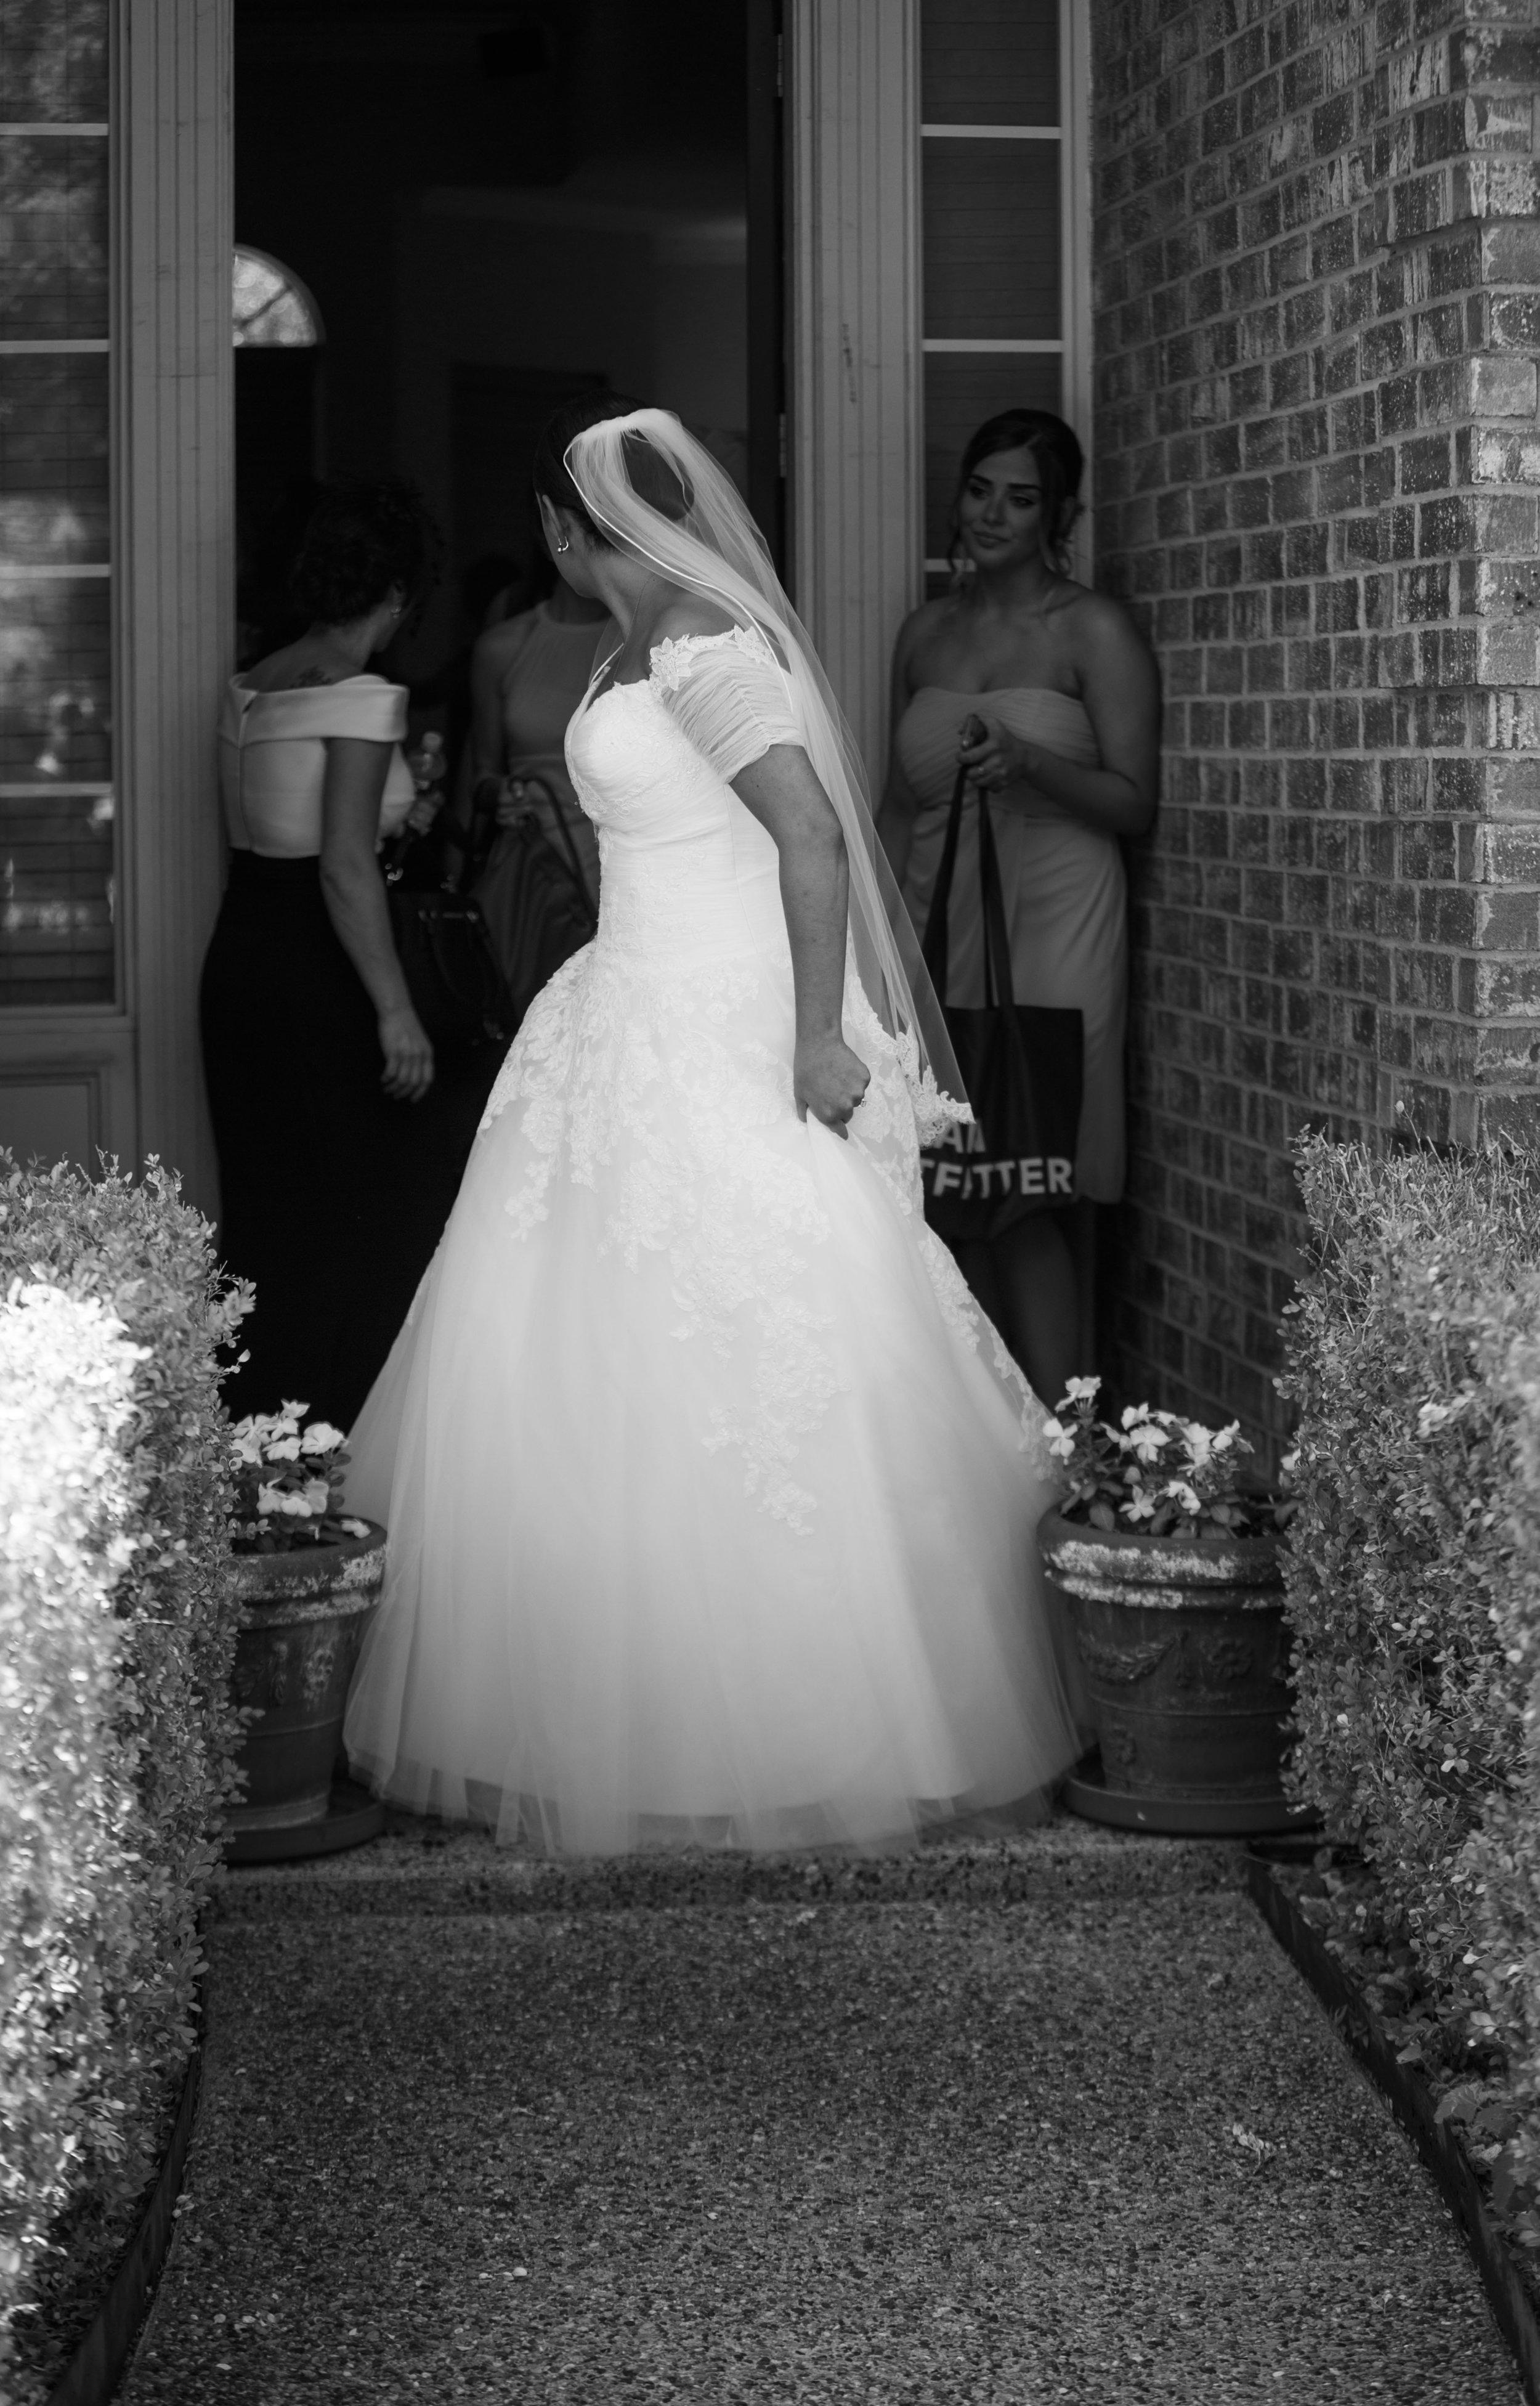 ATGI_Magali & Josh Wedding_2S8A0314.jpg